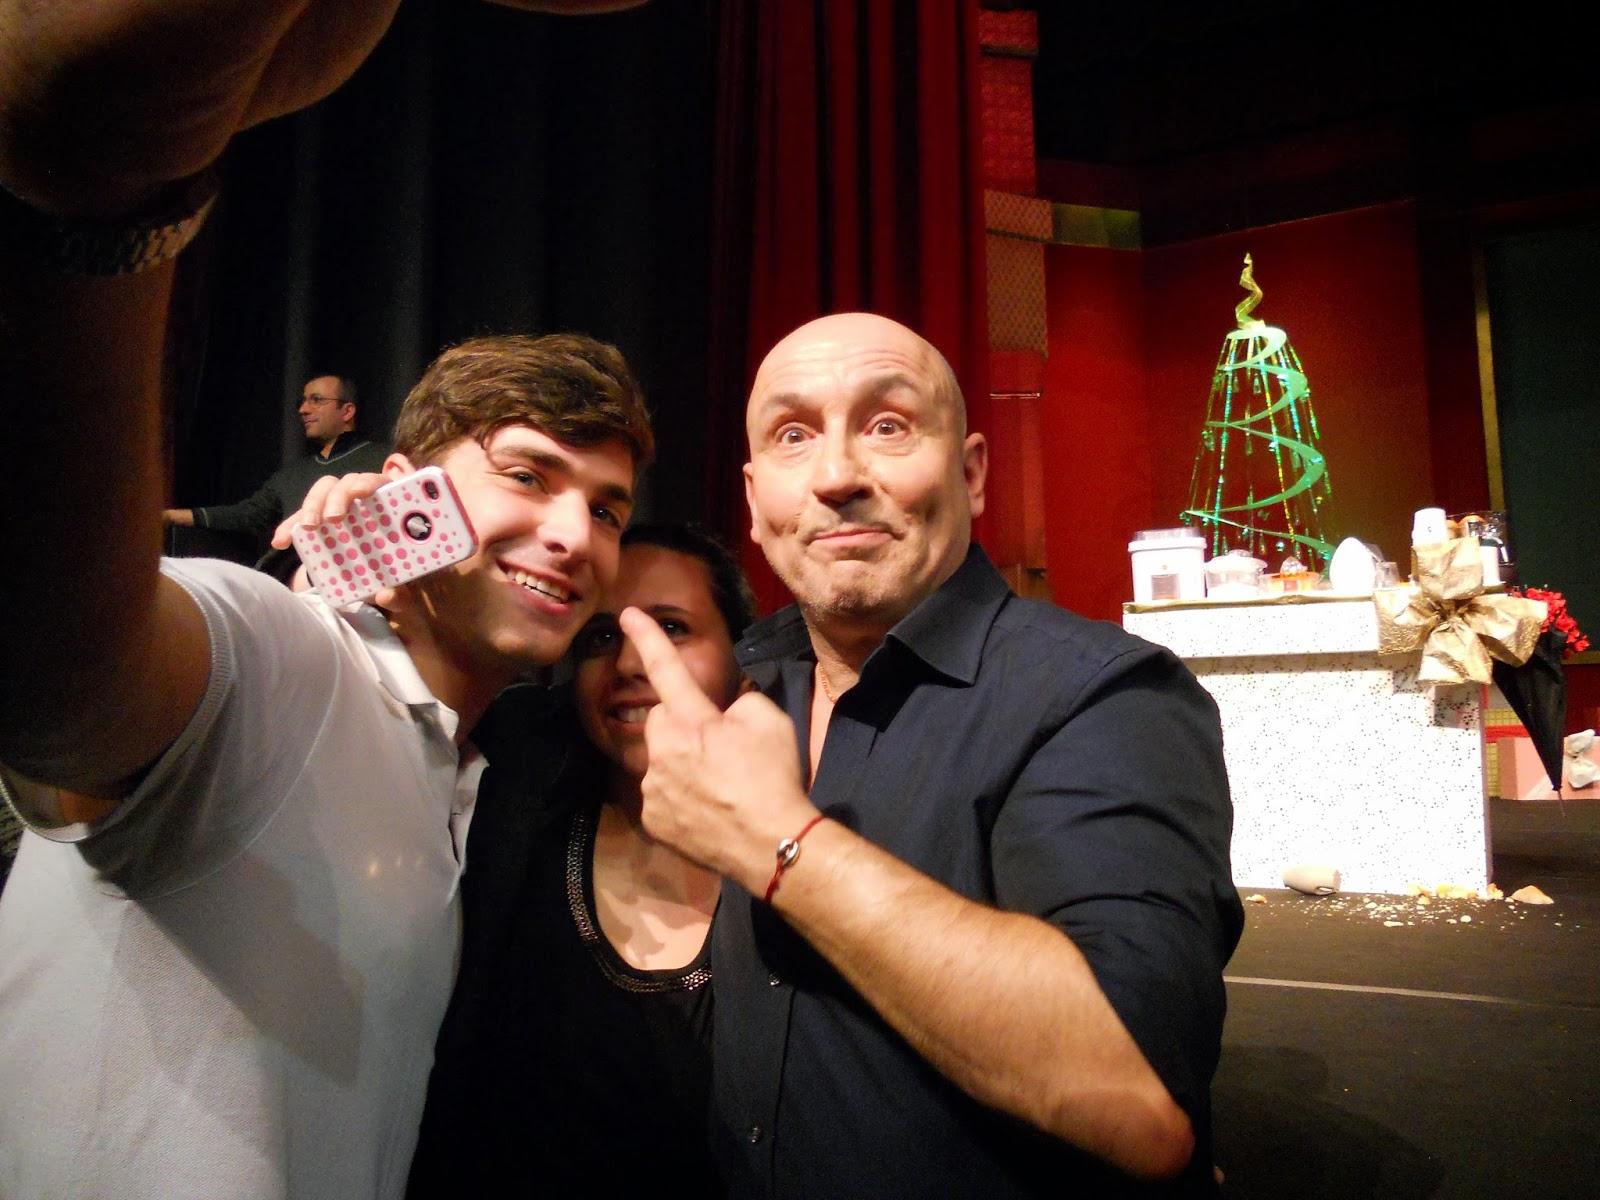 Matrimonio Comico Romano : Rendez vous maurizio battista al teatro brancaccio